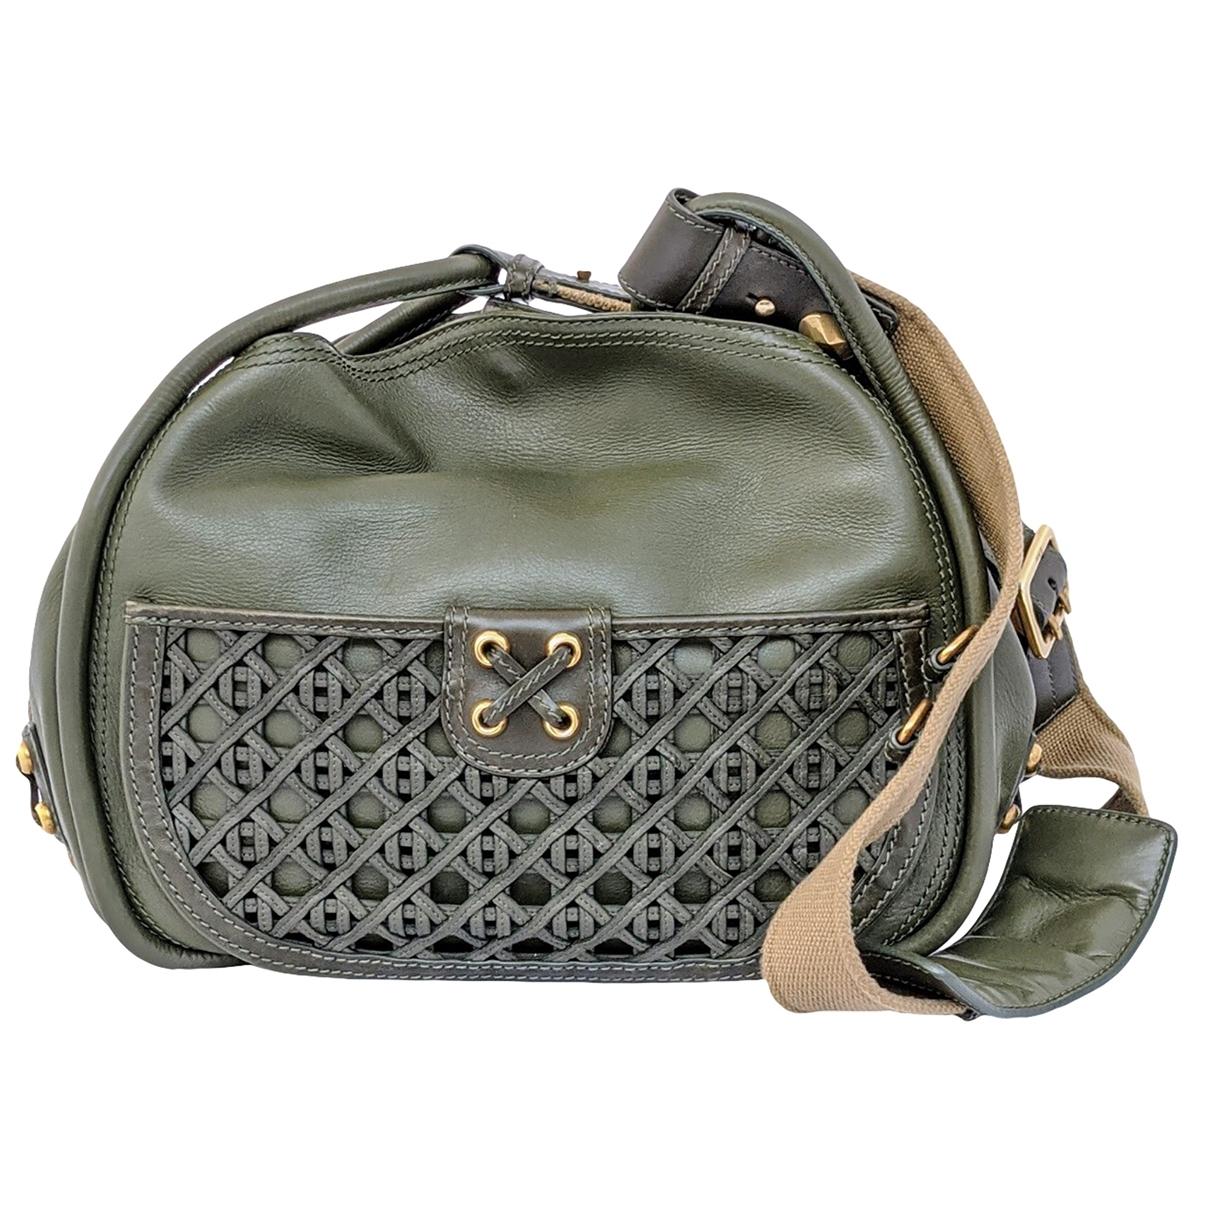 Dior \N Khaki Leather handbag for Women \N